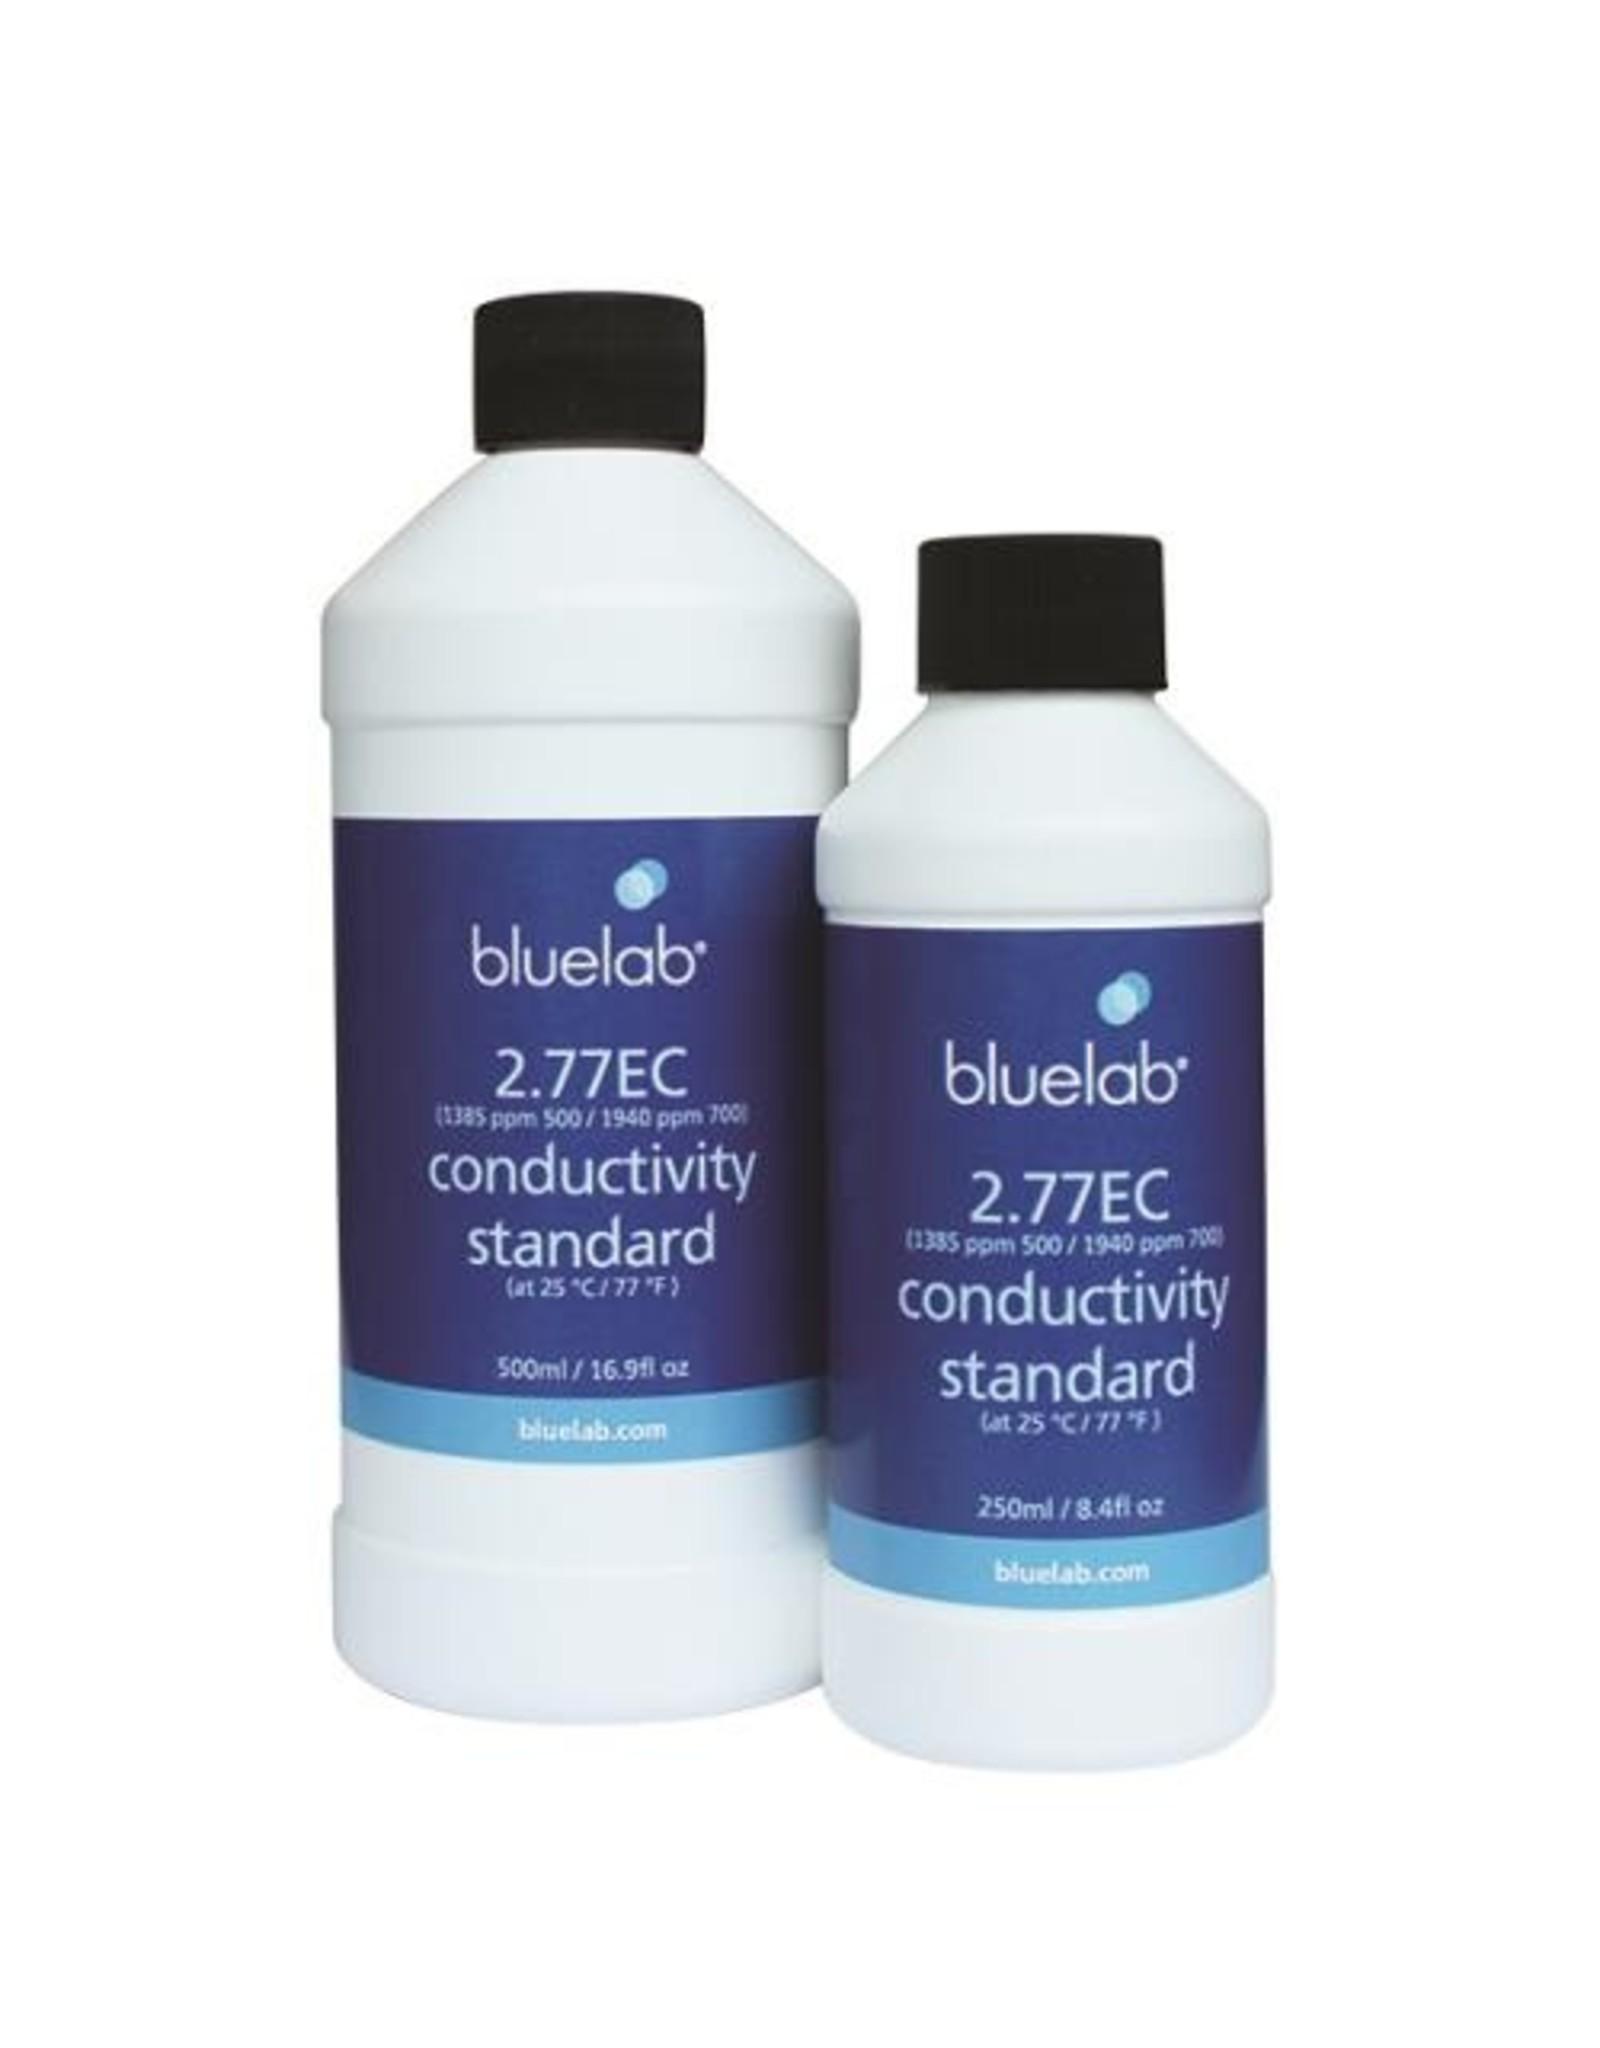 Bluelab Bluelab 2.77EC Conductivity Solution 250 ml